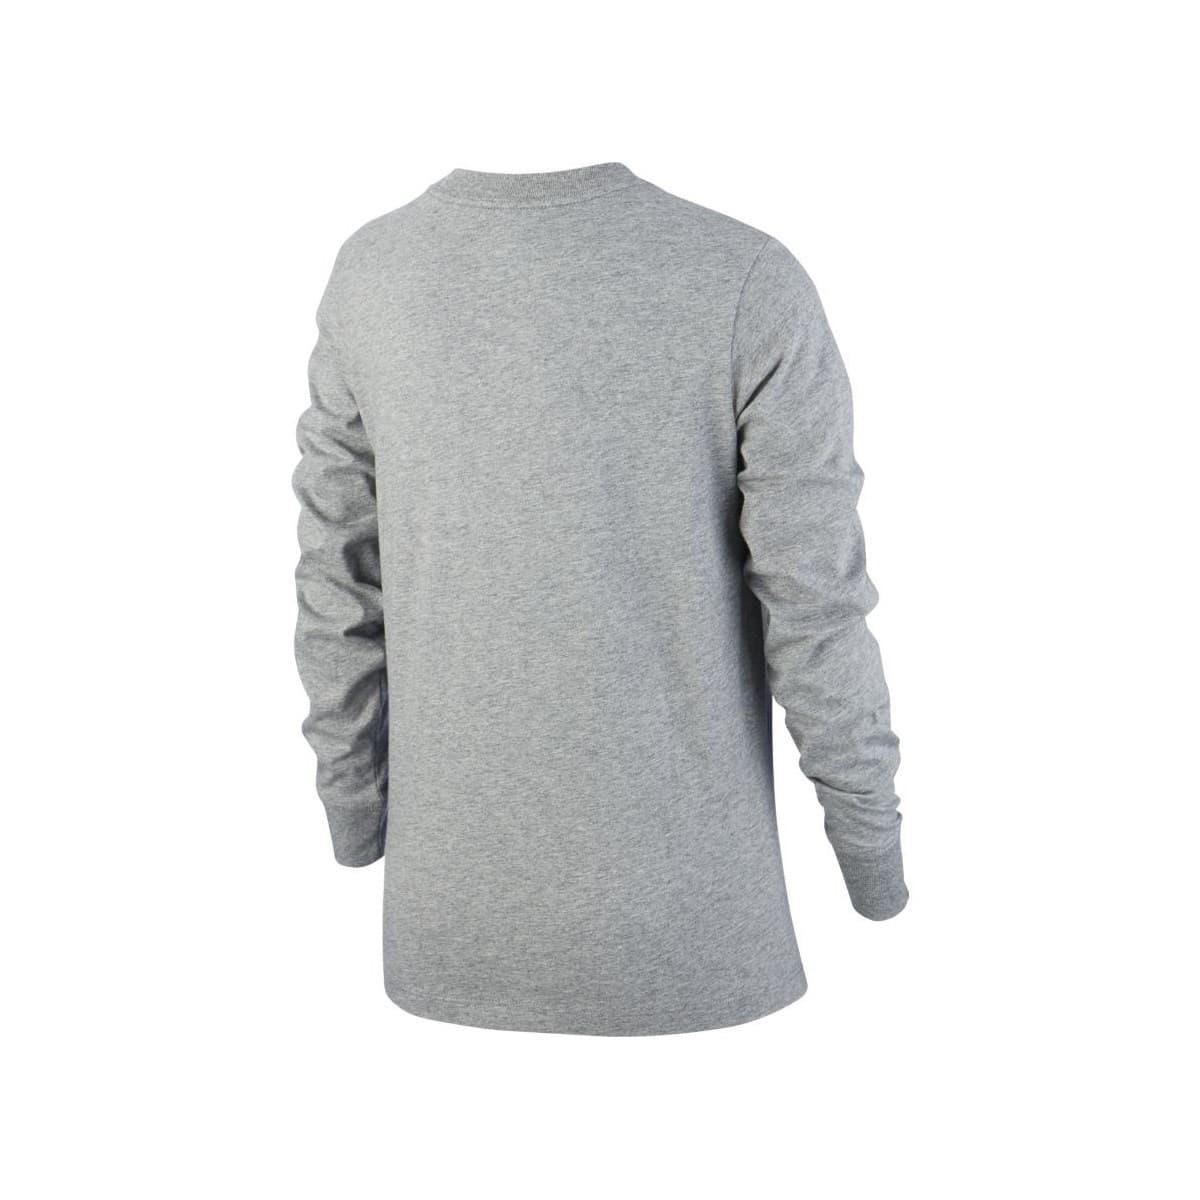 Essentials Futura Hook Çocuk Gri Sweatshirt (CI8295-091)